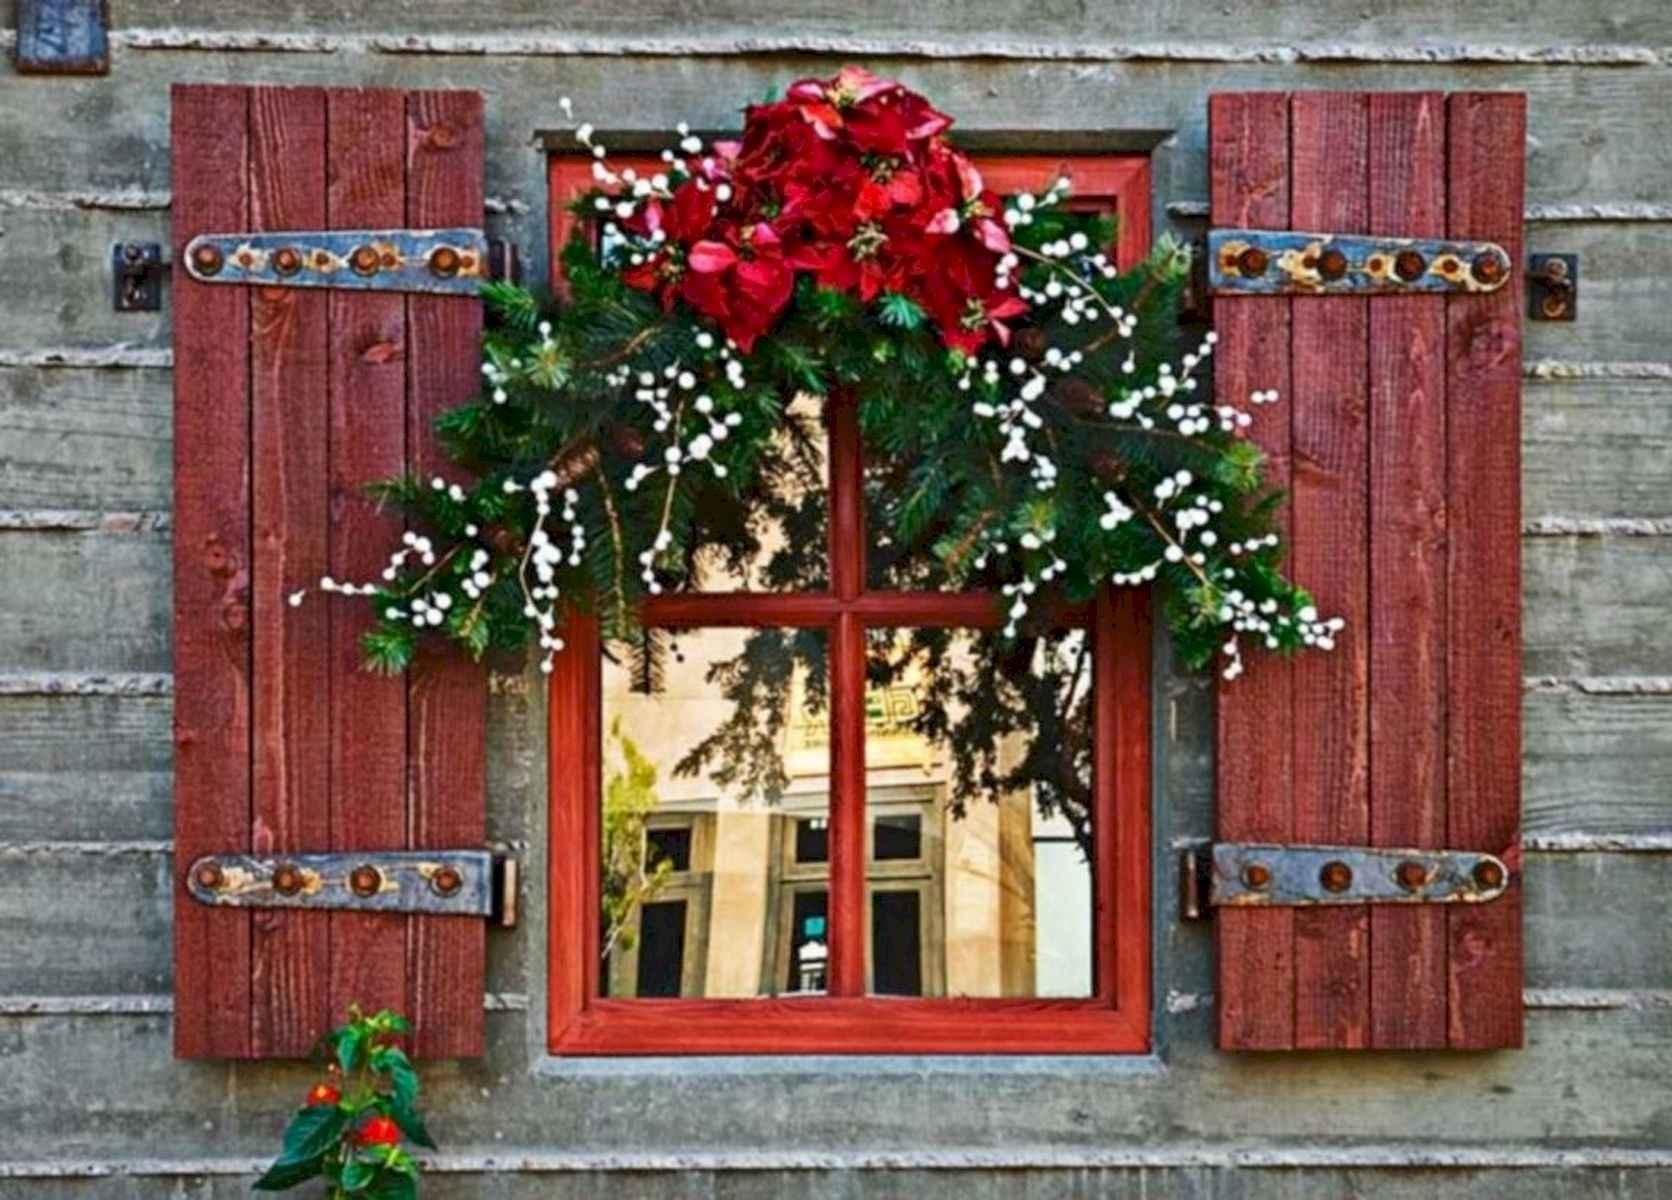 40 amazing outdoor christmas decorations ideas (24)